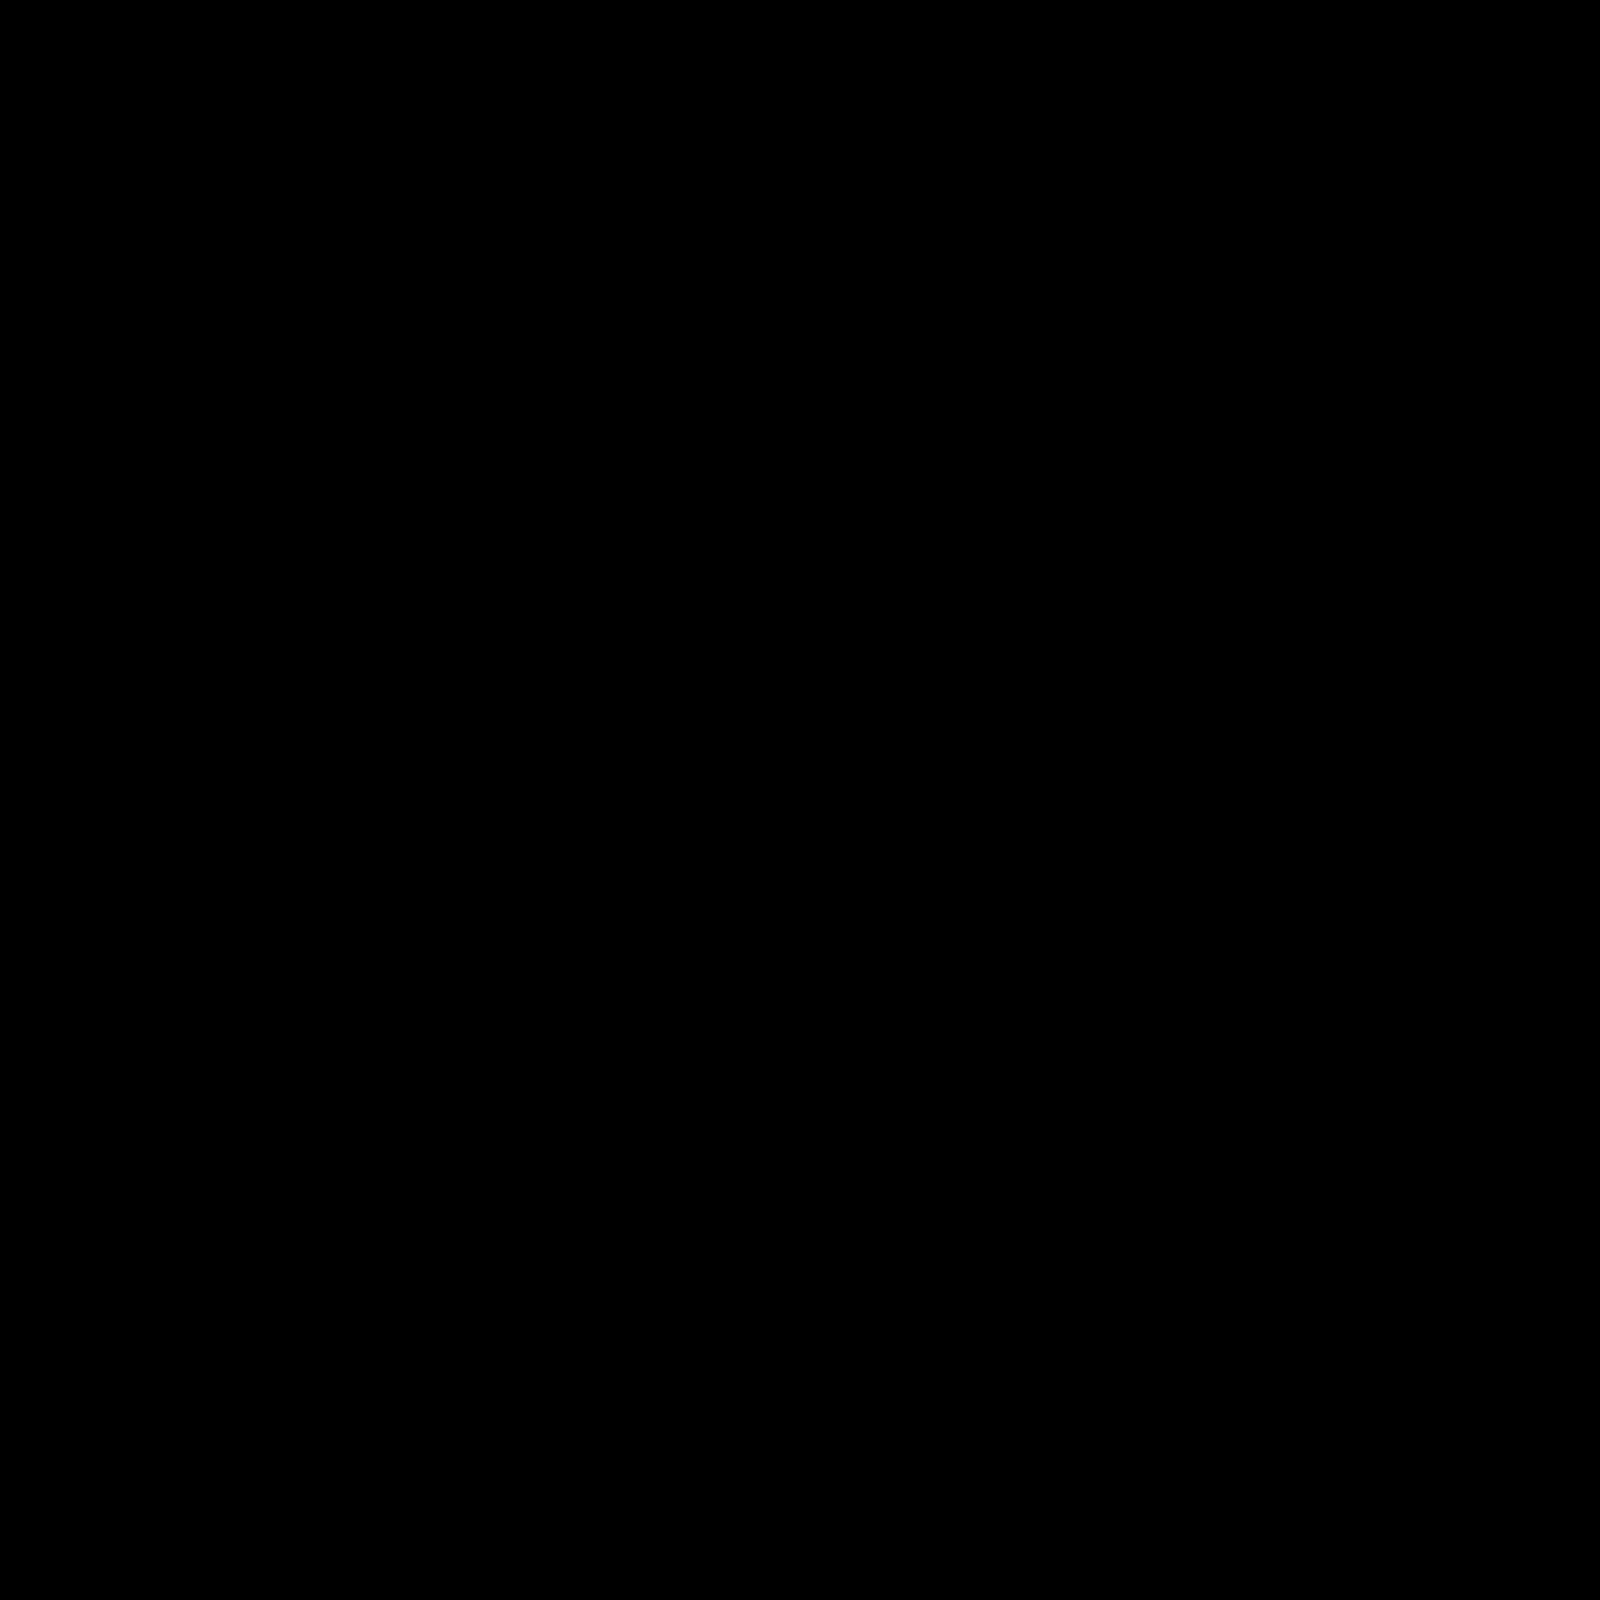 Circled Right icon